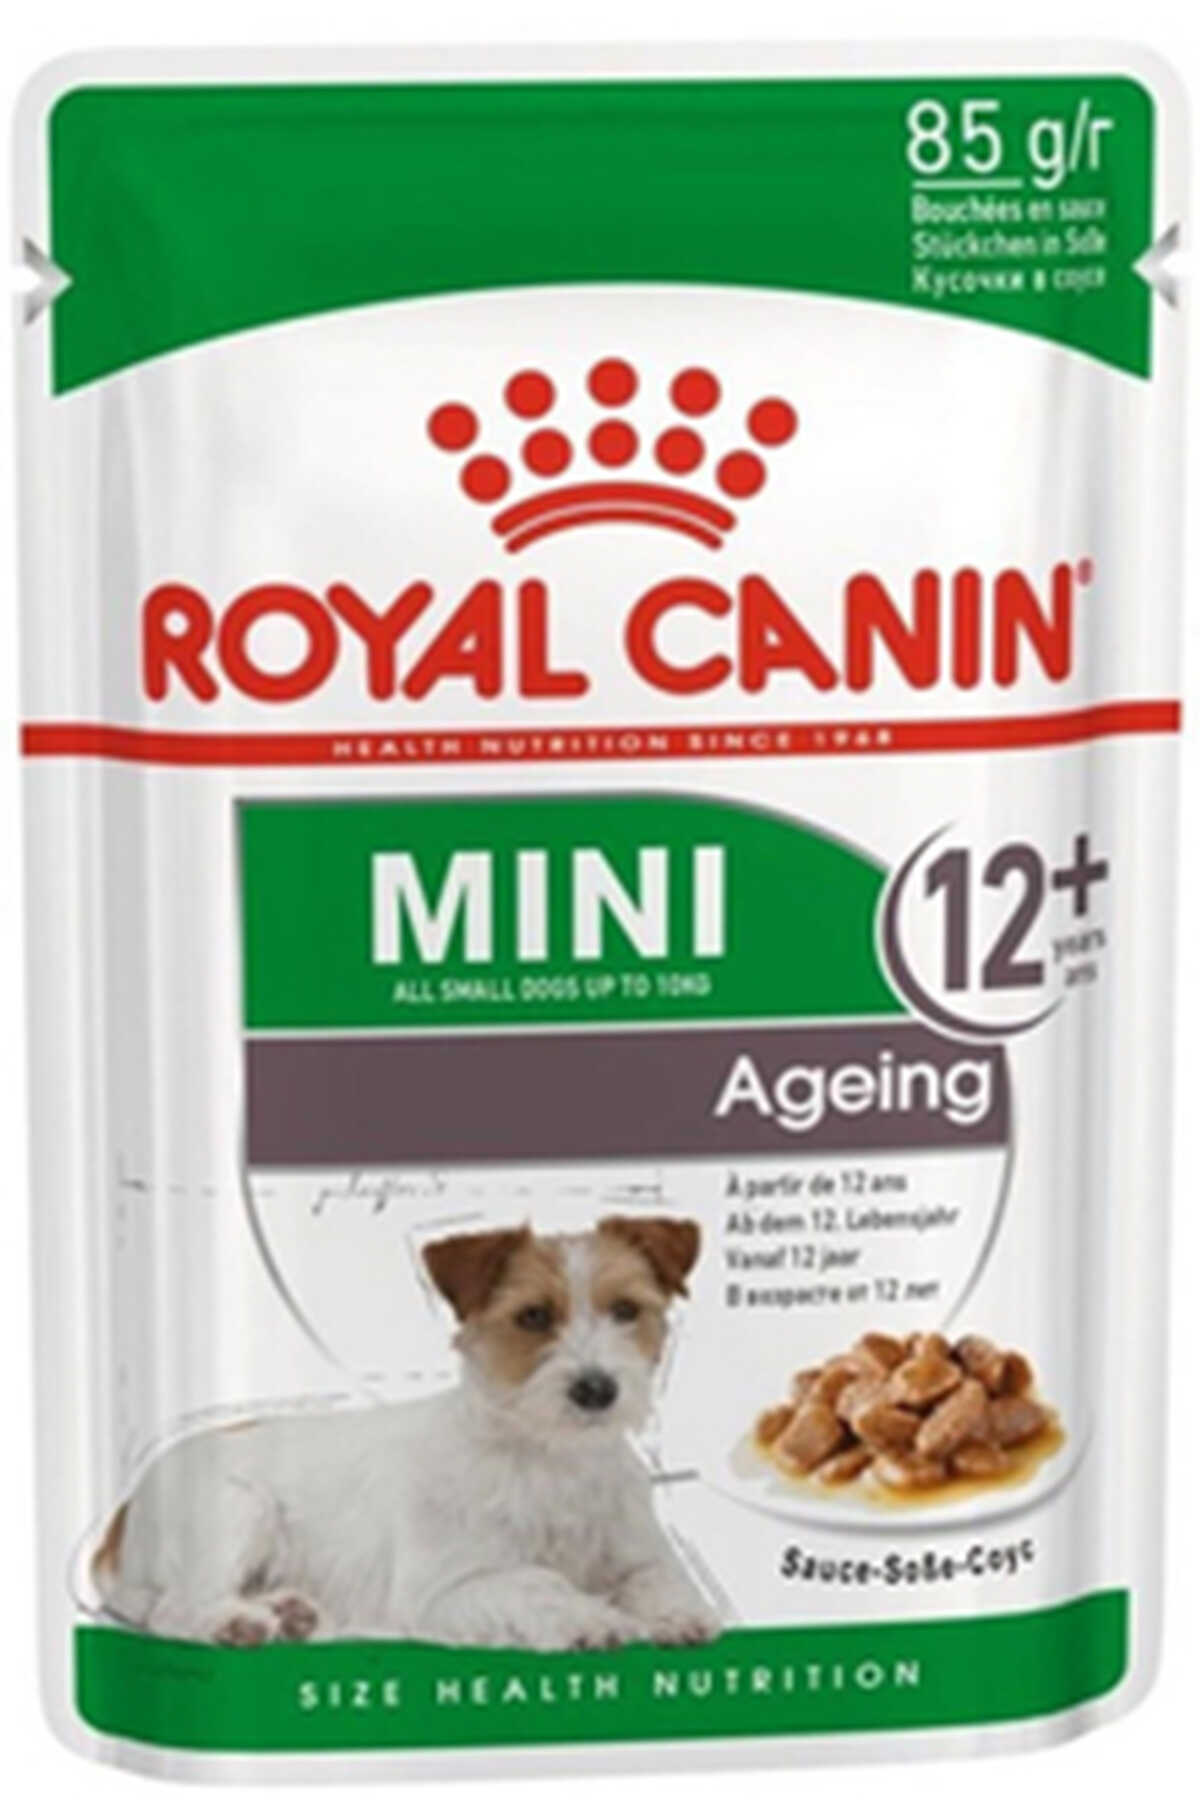 Royal Canin Mini +12 Ageing Pouch Yaşlı Köpek Konservesi 85gr